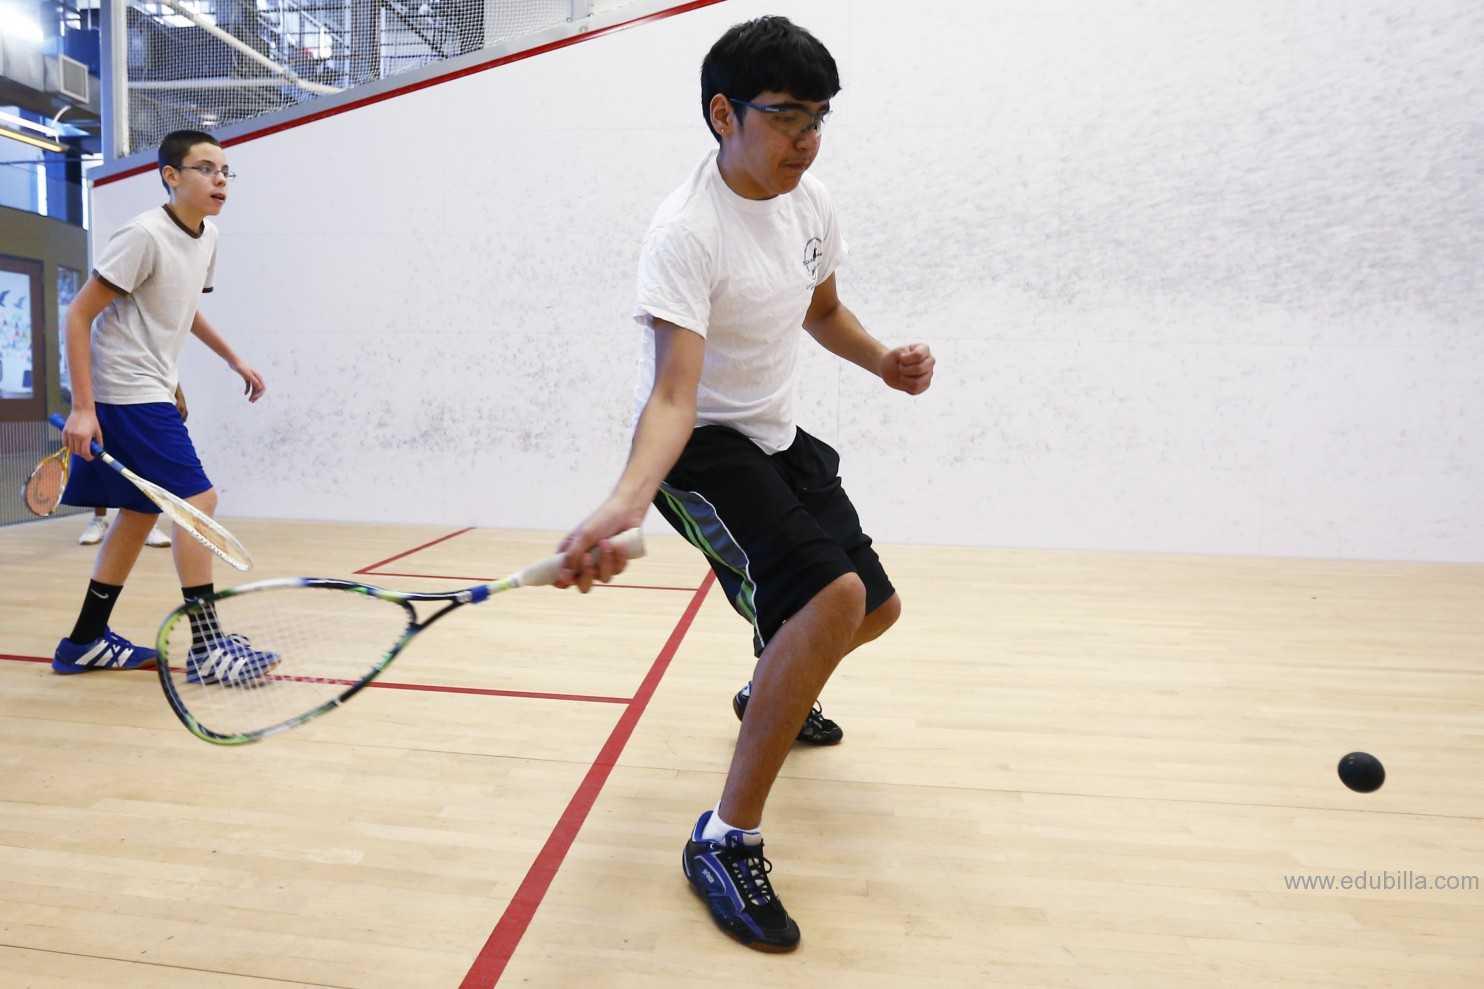 squashsport11.jpg